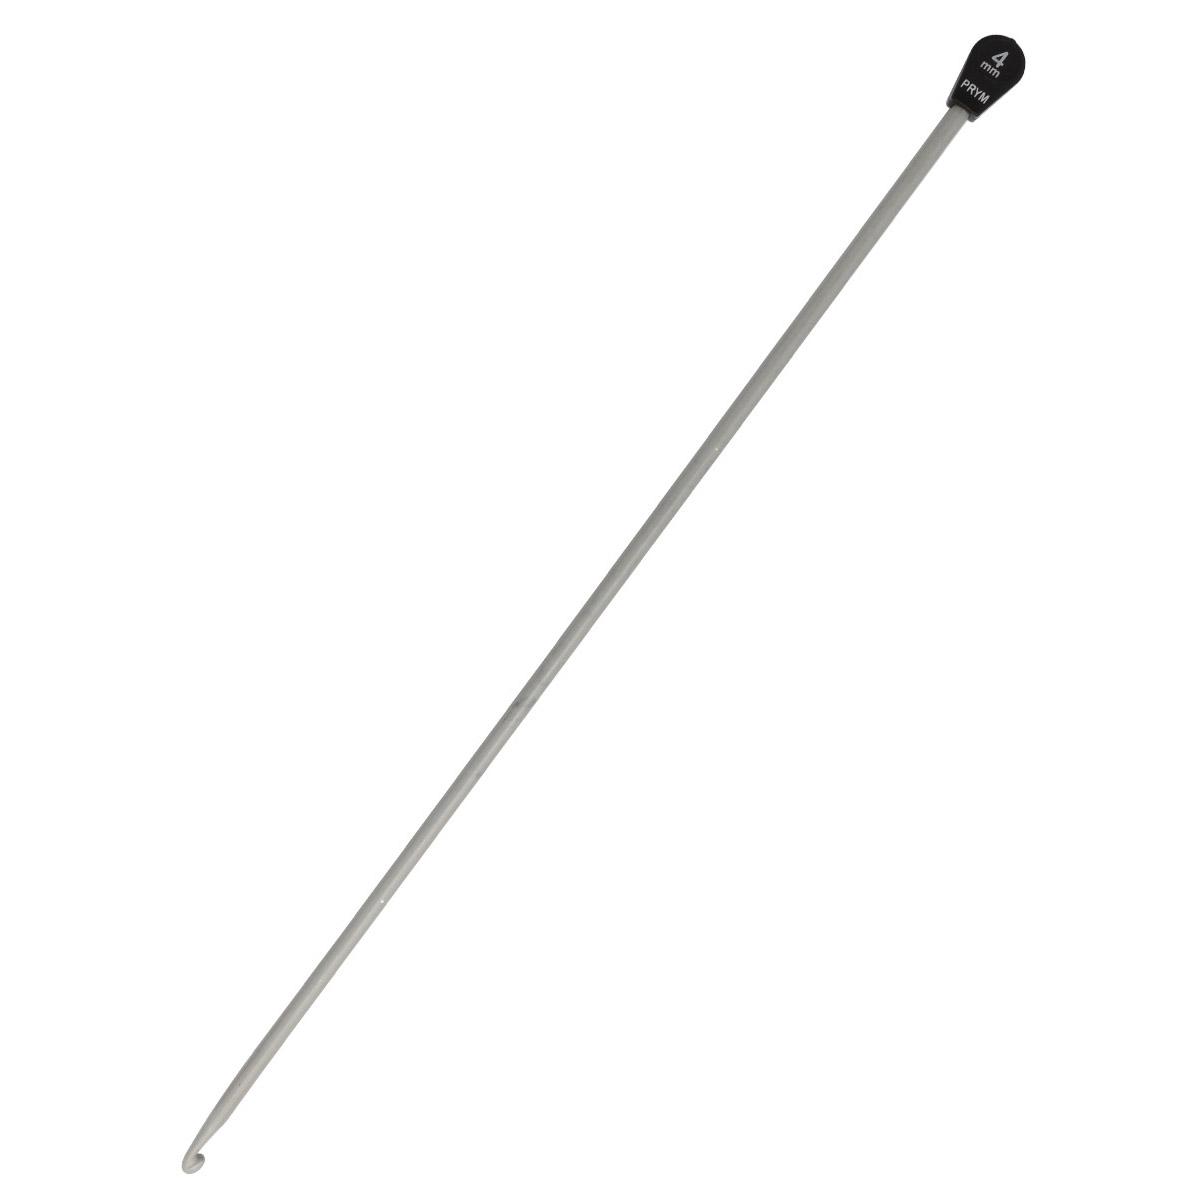 195217 Крючок для вязания тунисский, 4 мм*30 см, Prym